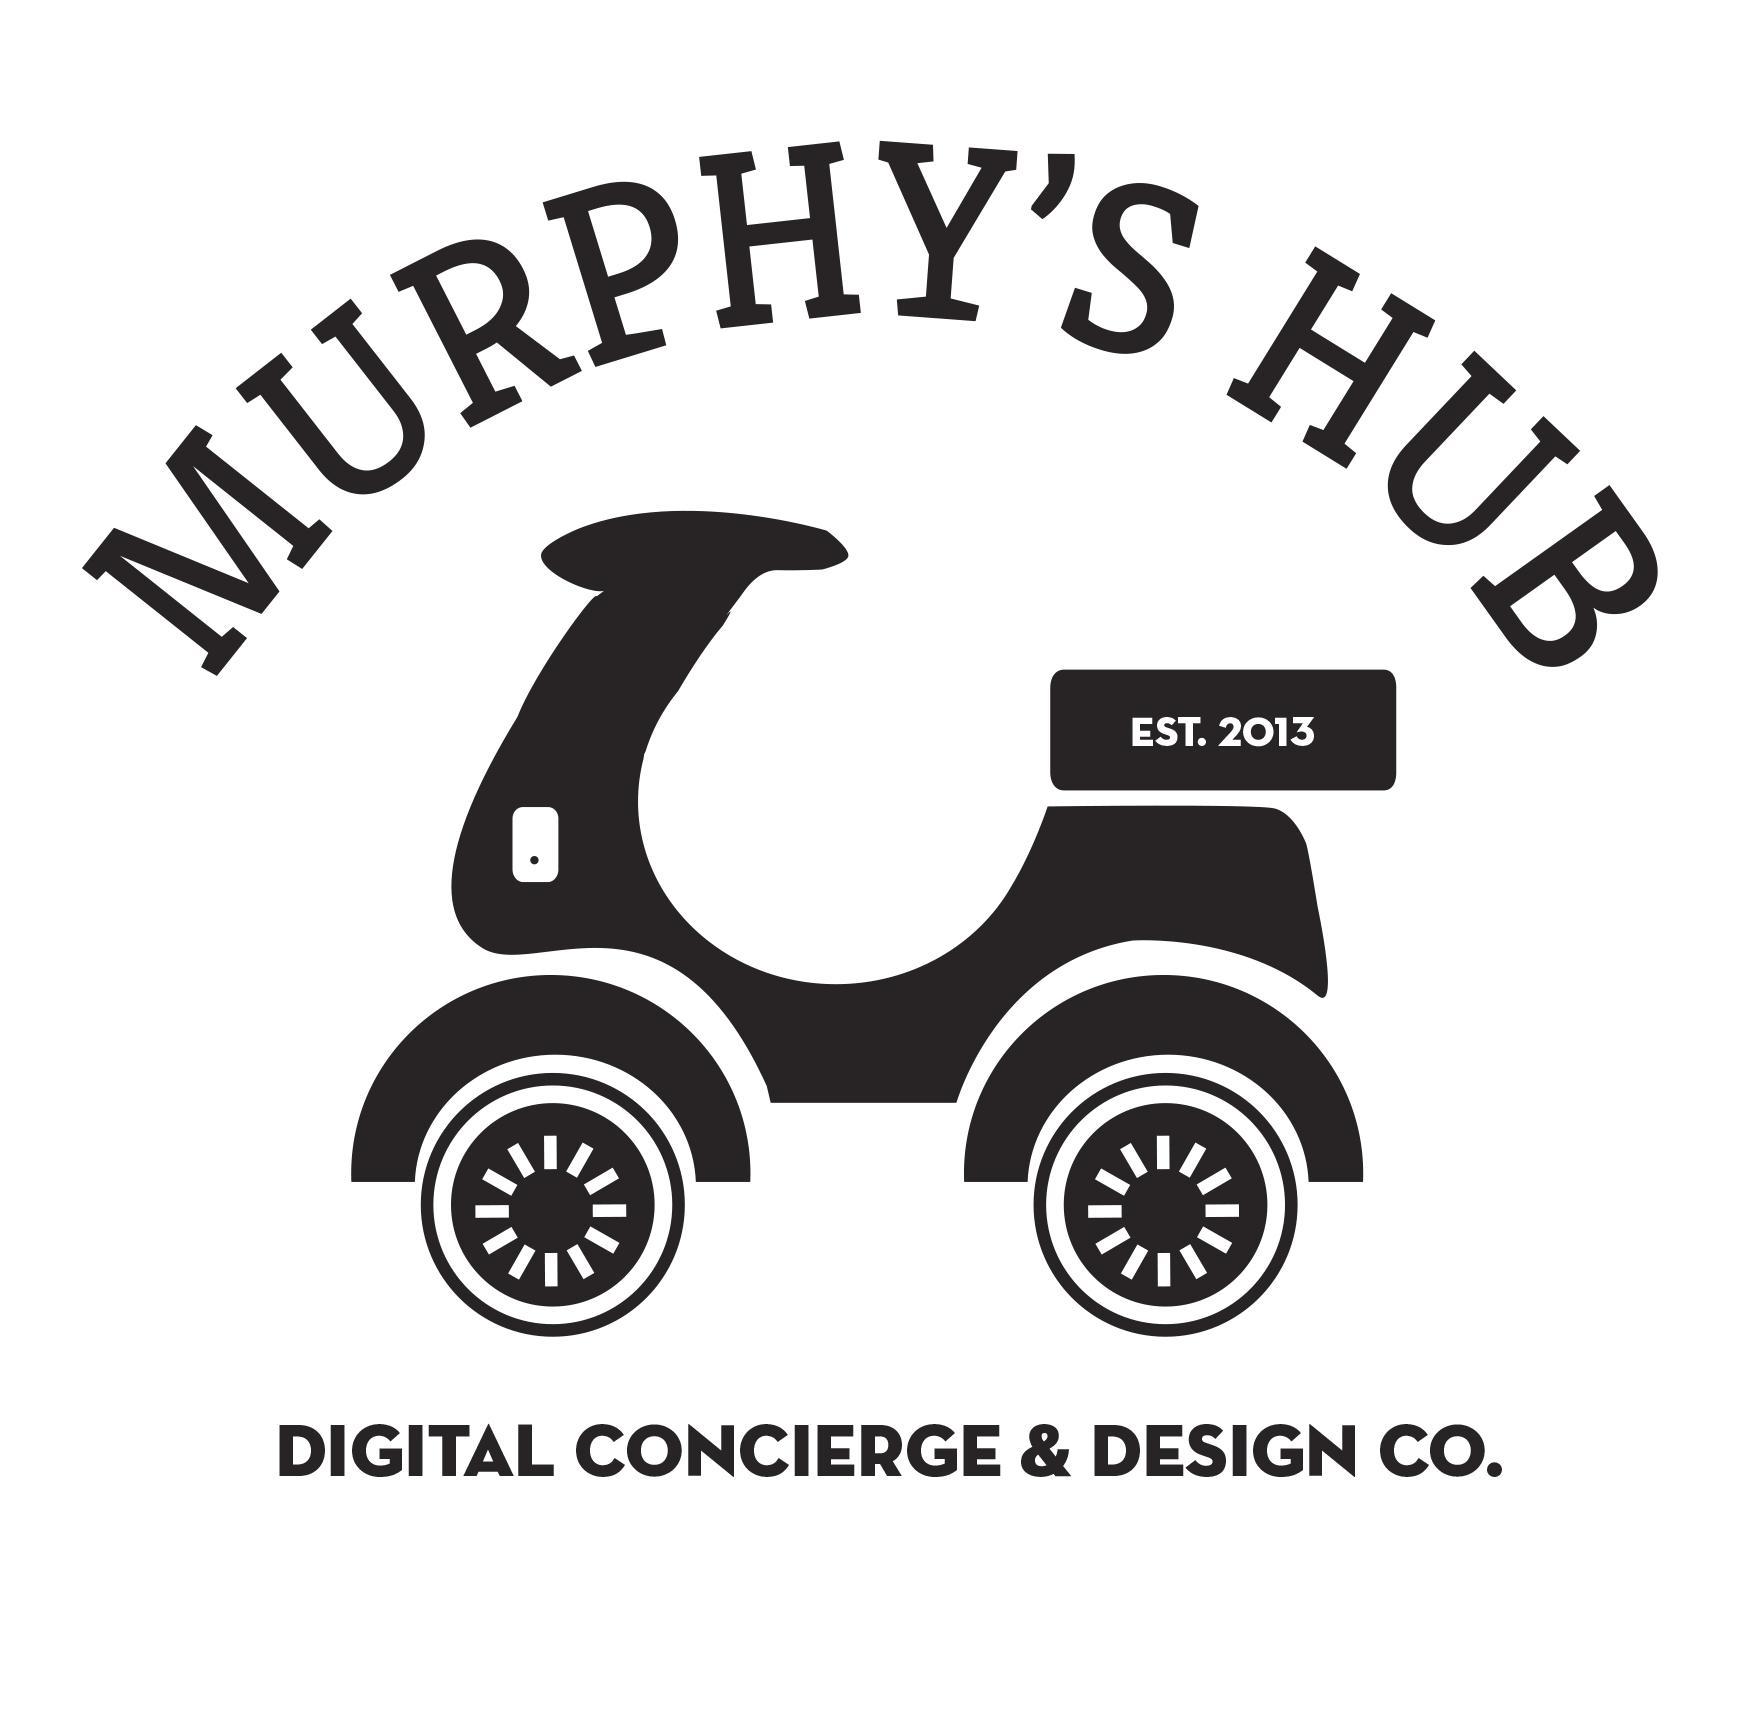 Murphy's Hub - image 1 - student project